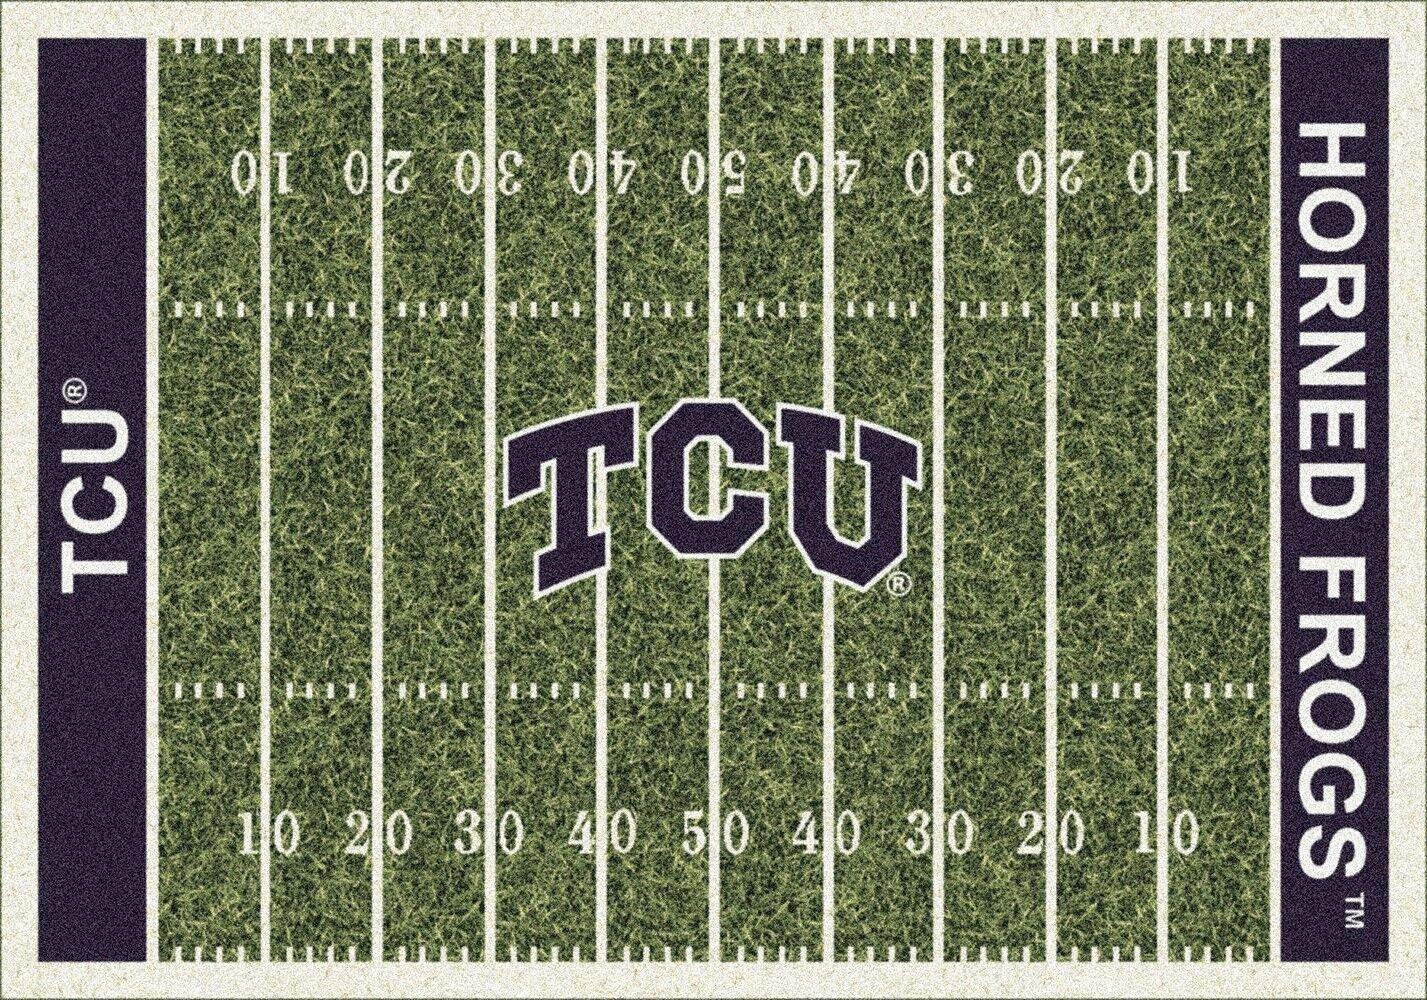 Texas Christian Horned Frogs Milliken NCAA Home Field Area Rug (5'4'' x 7'8'') by Milliken